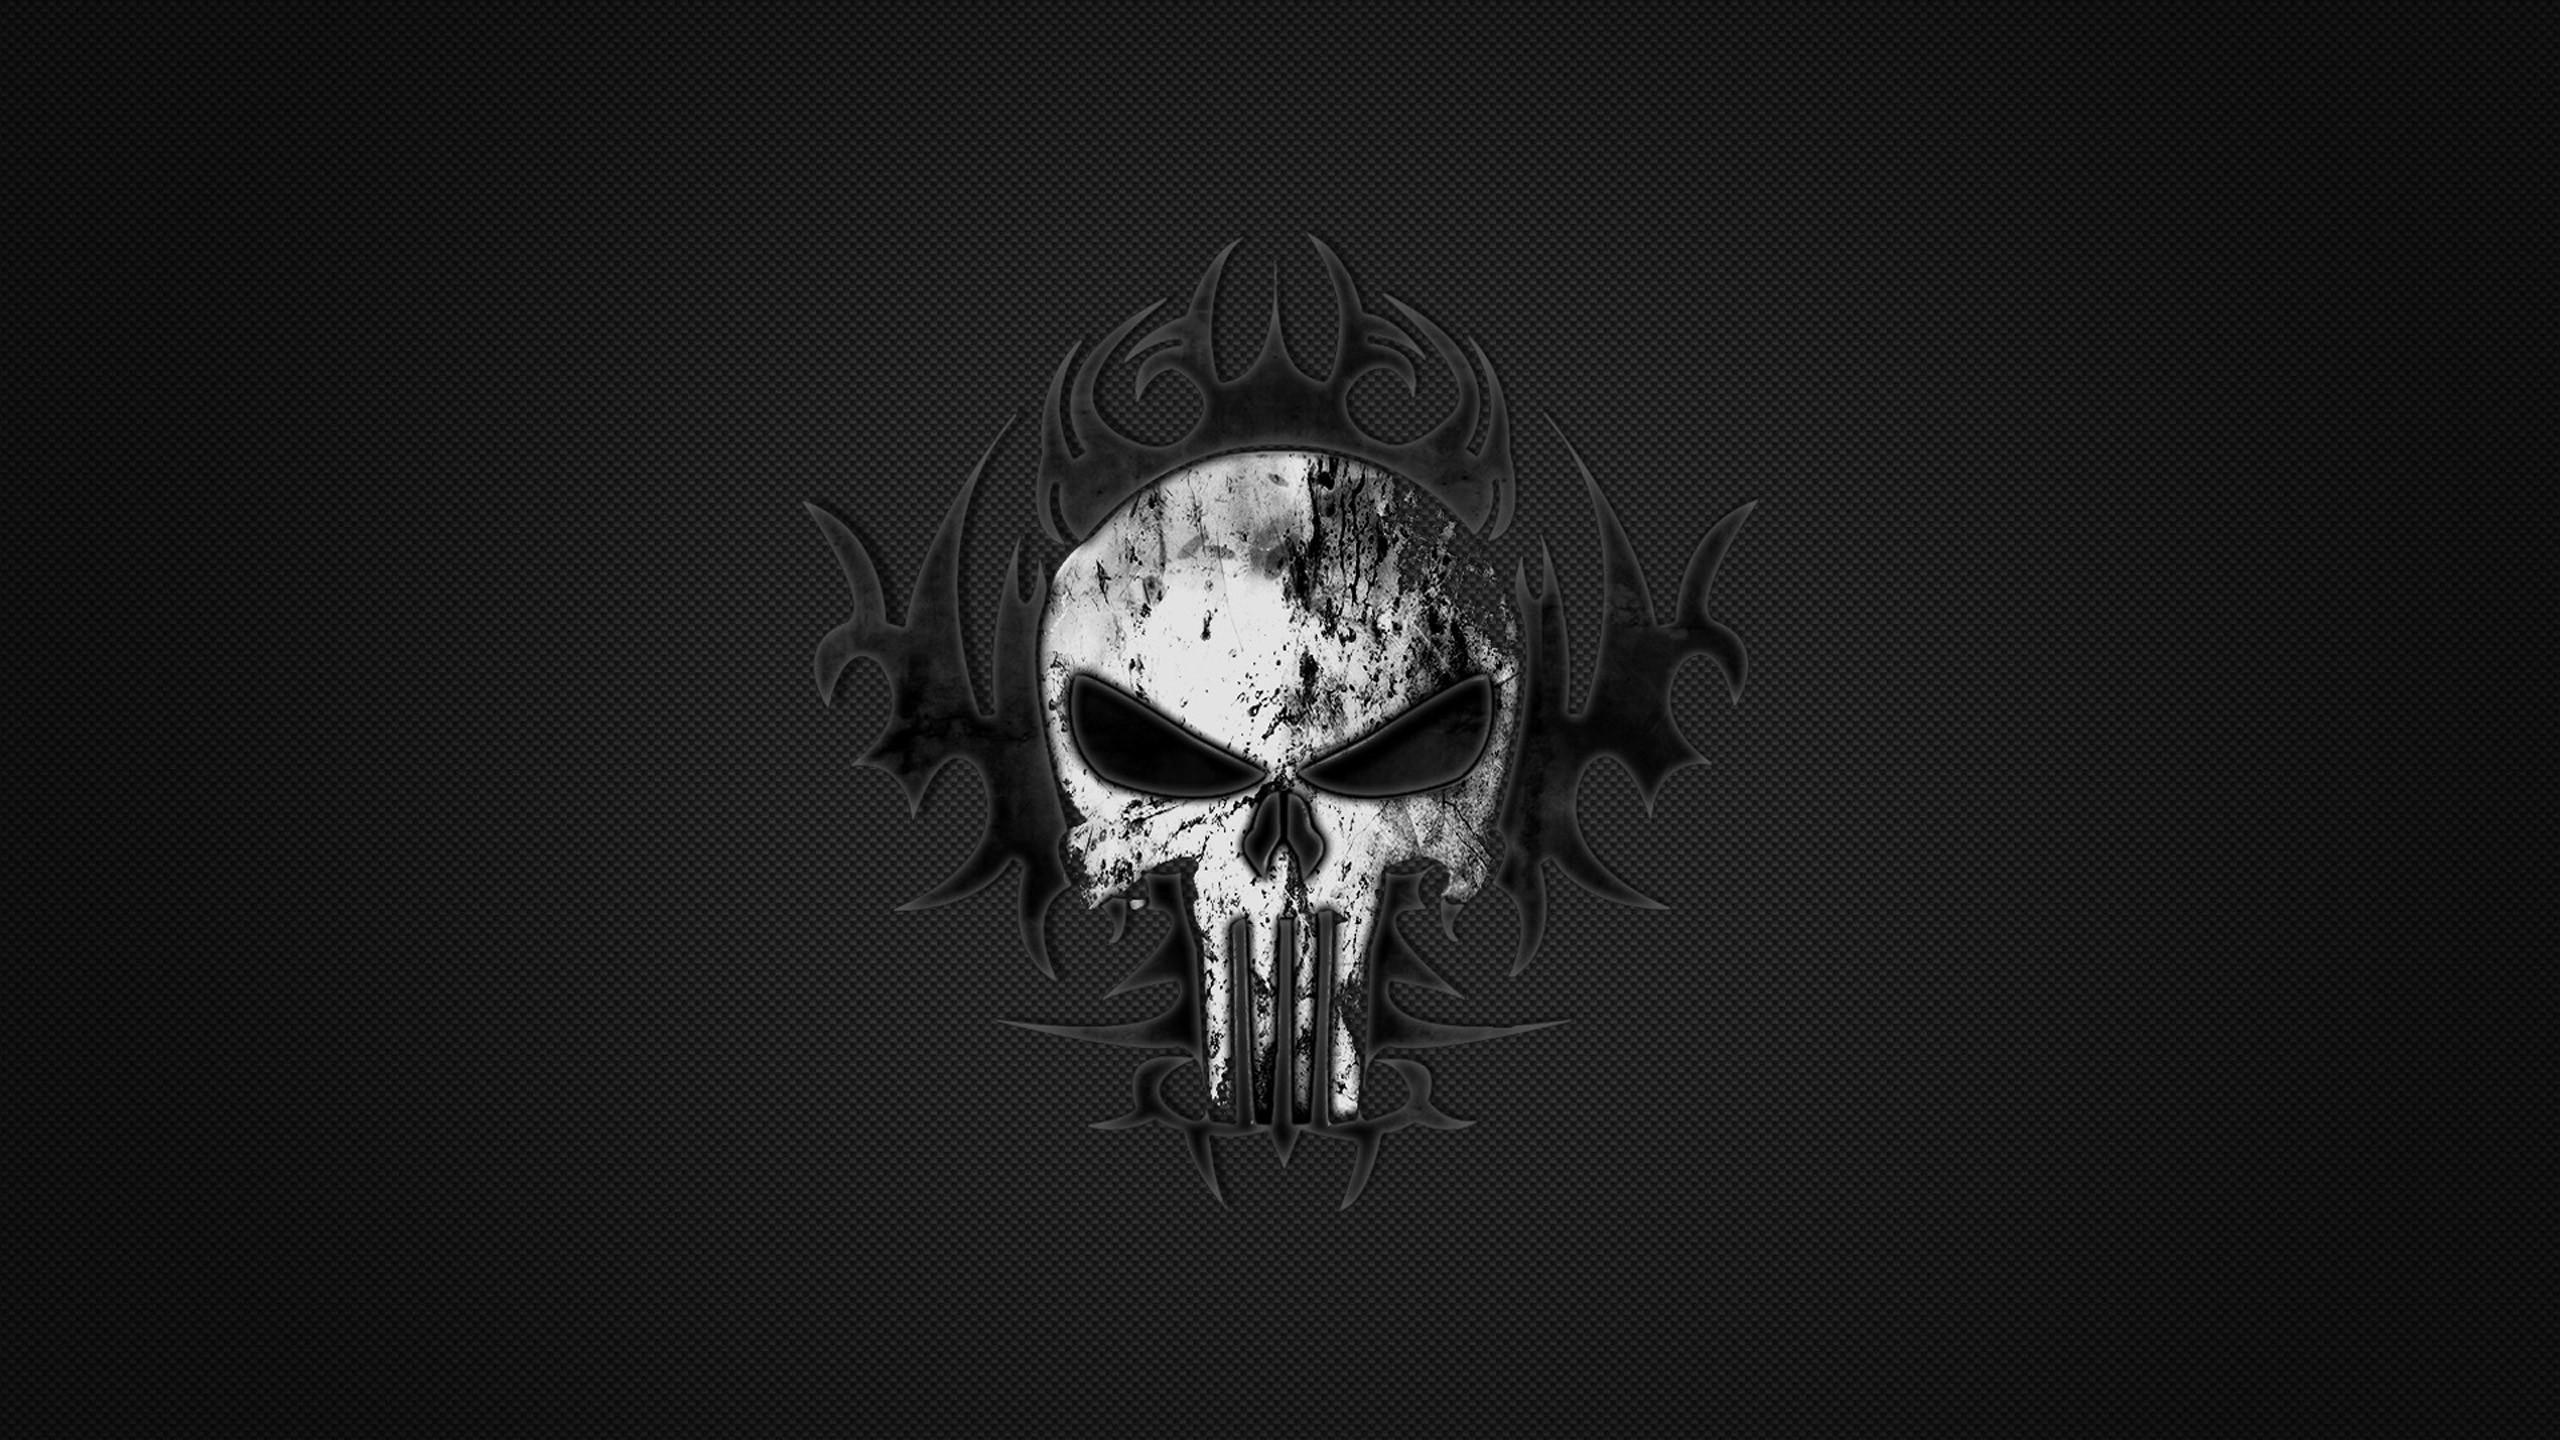 Skull 3d Wallpaper: Punisher Wallpaper Skull ·①